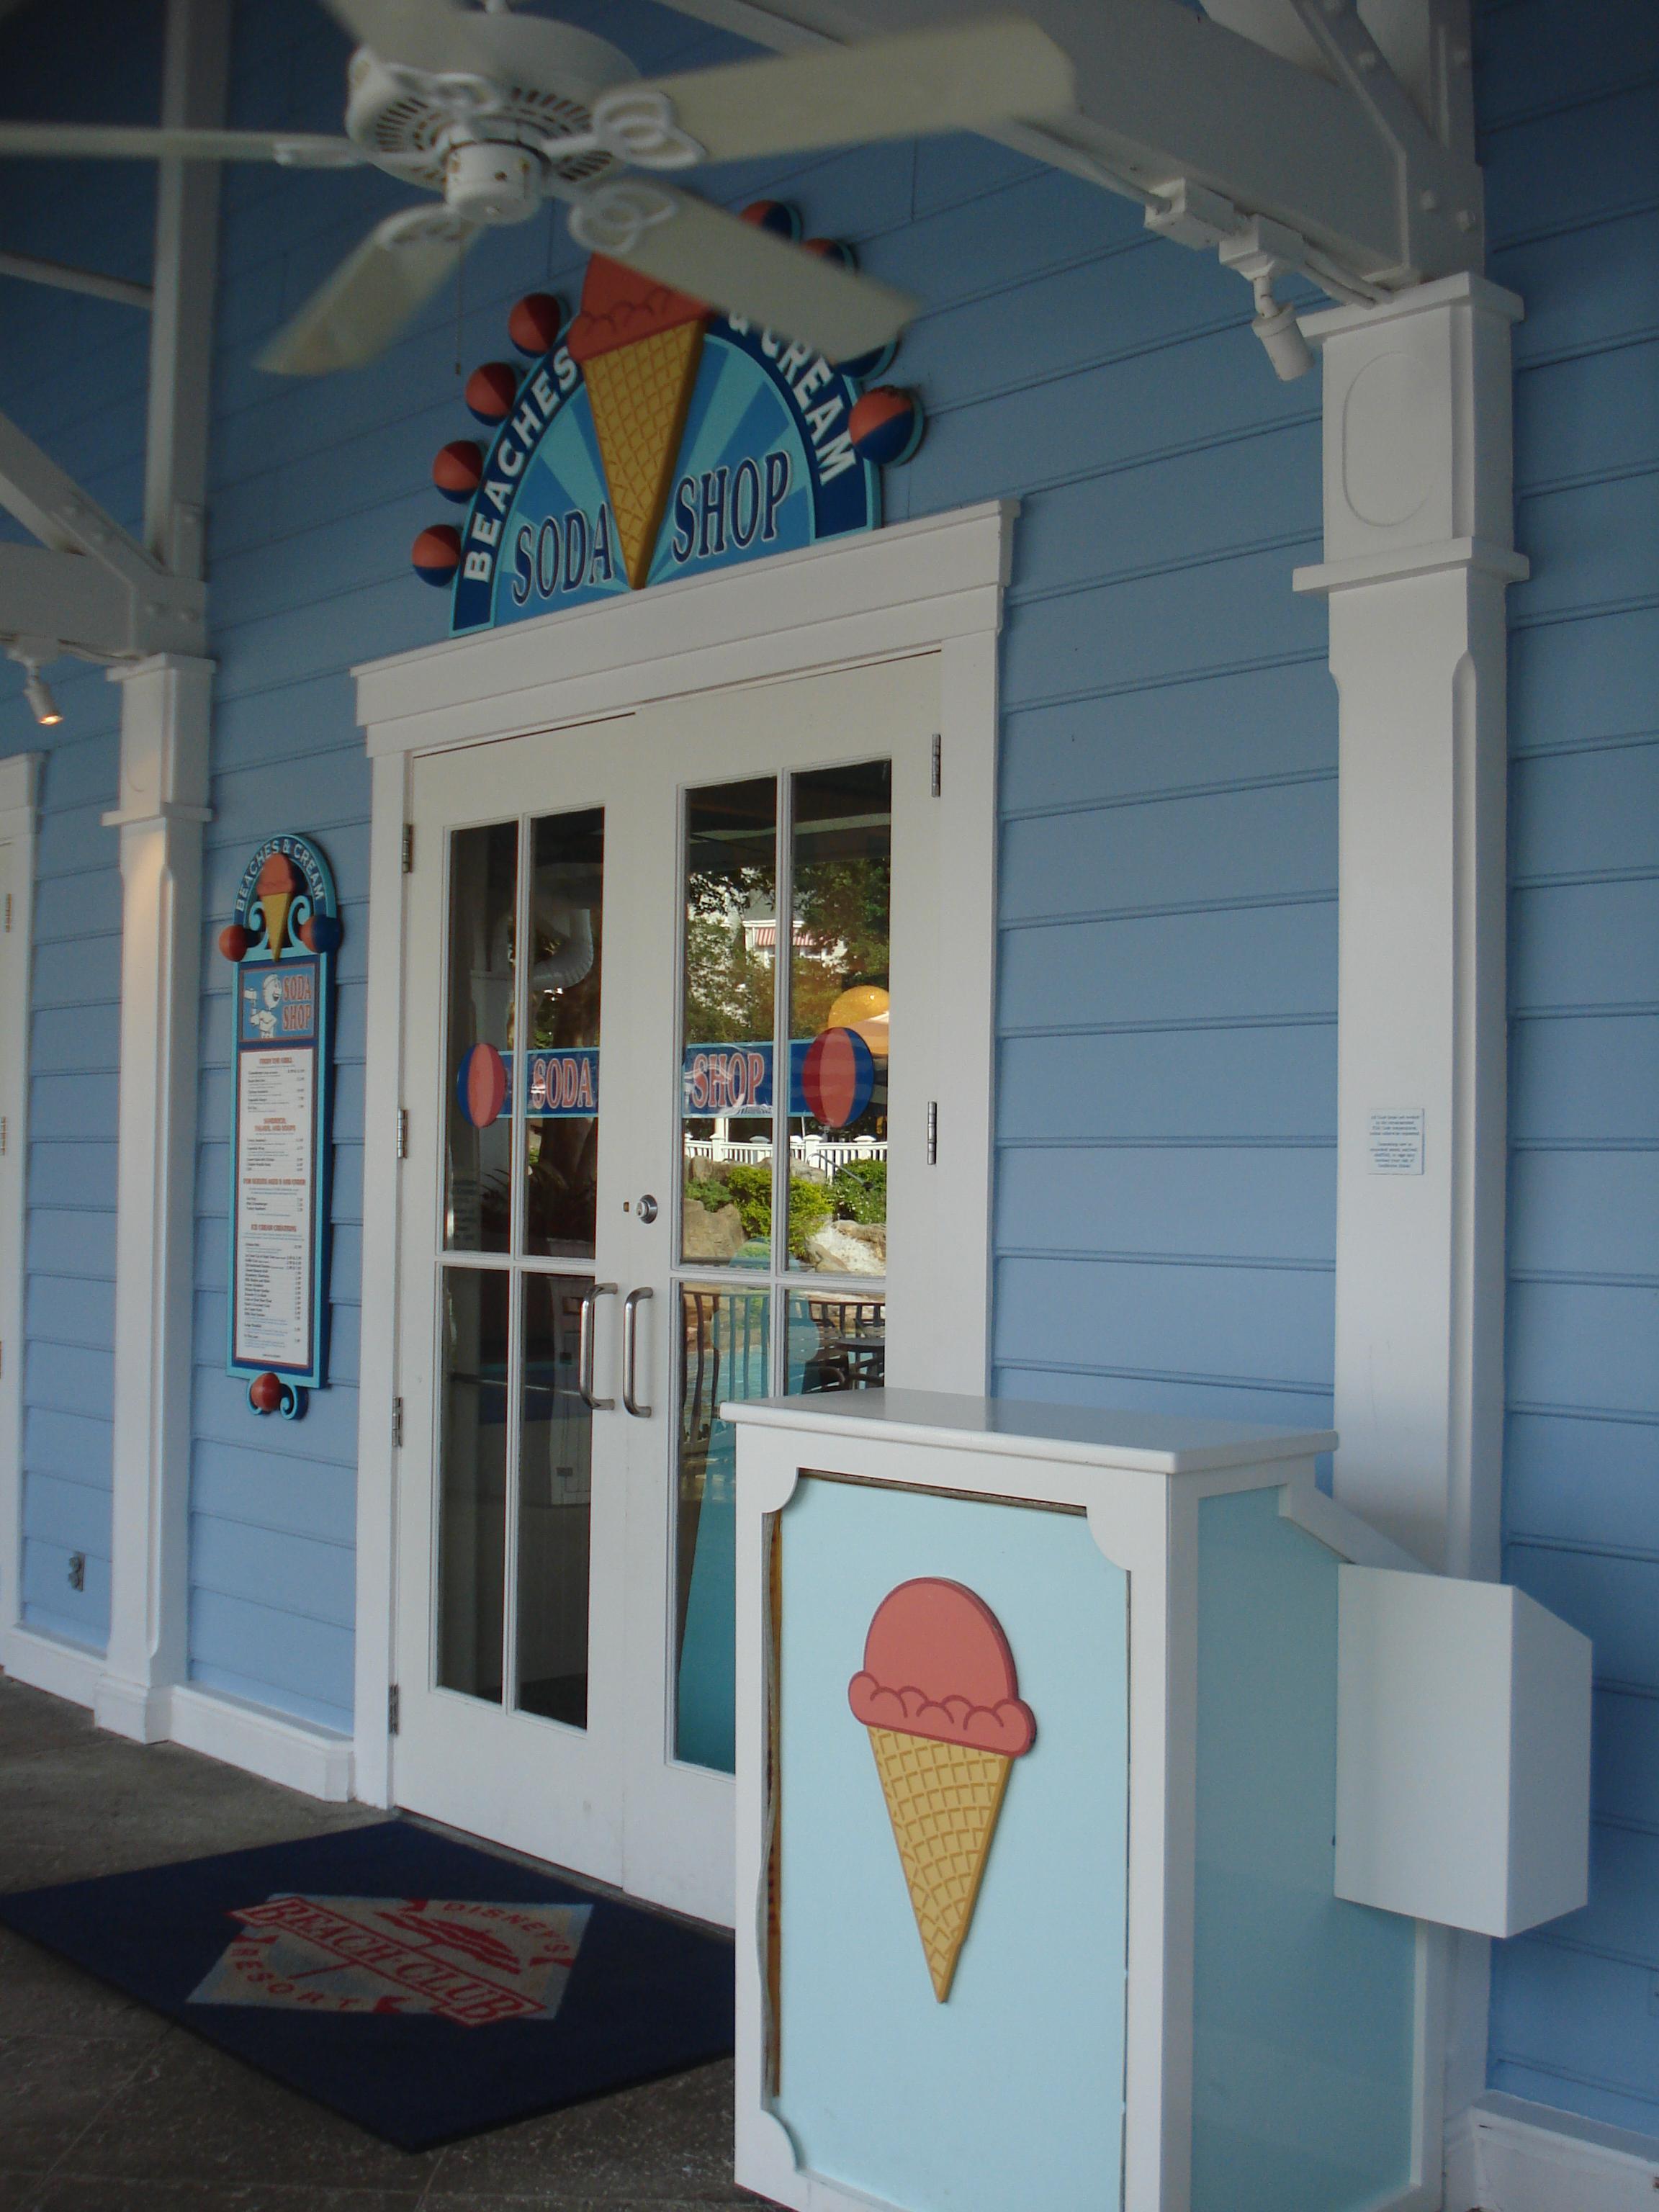 Disney Beaches and Cream Soda Shop